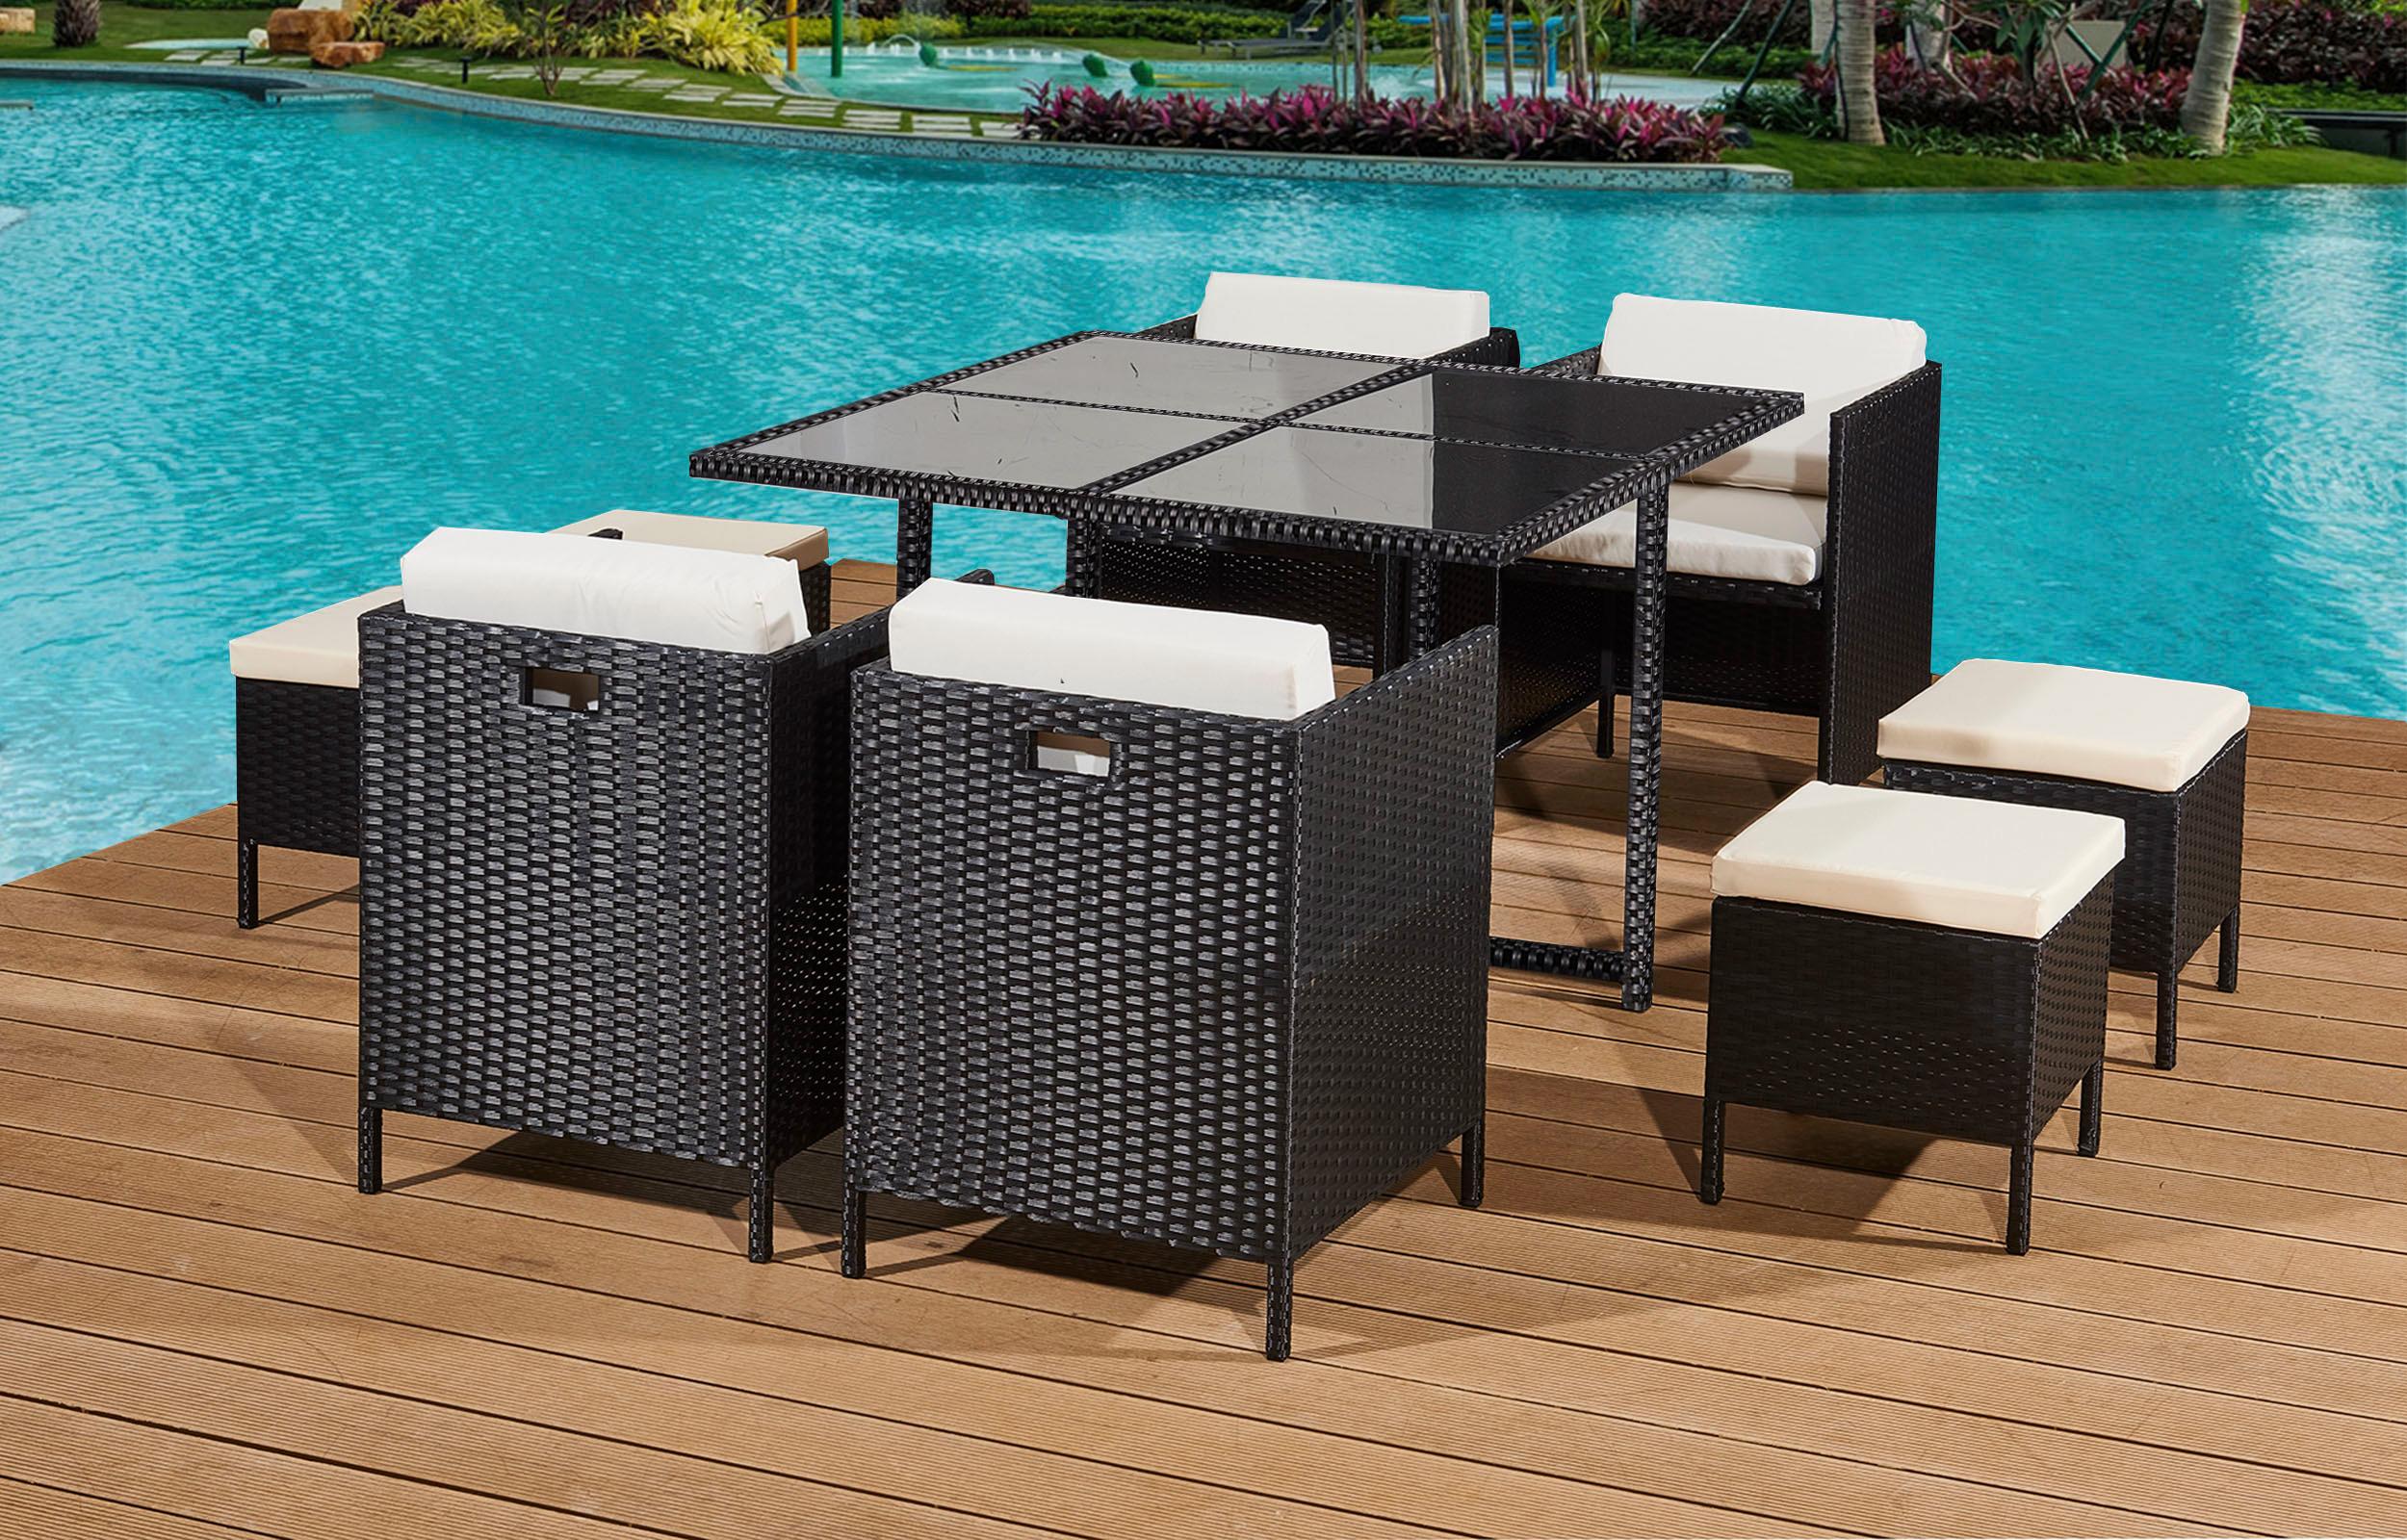 rattan garden furniture patio dining set 8 seat cube daniel james products. Black Bedroom Furniture Sets. Home Design Ideas